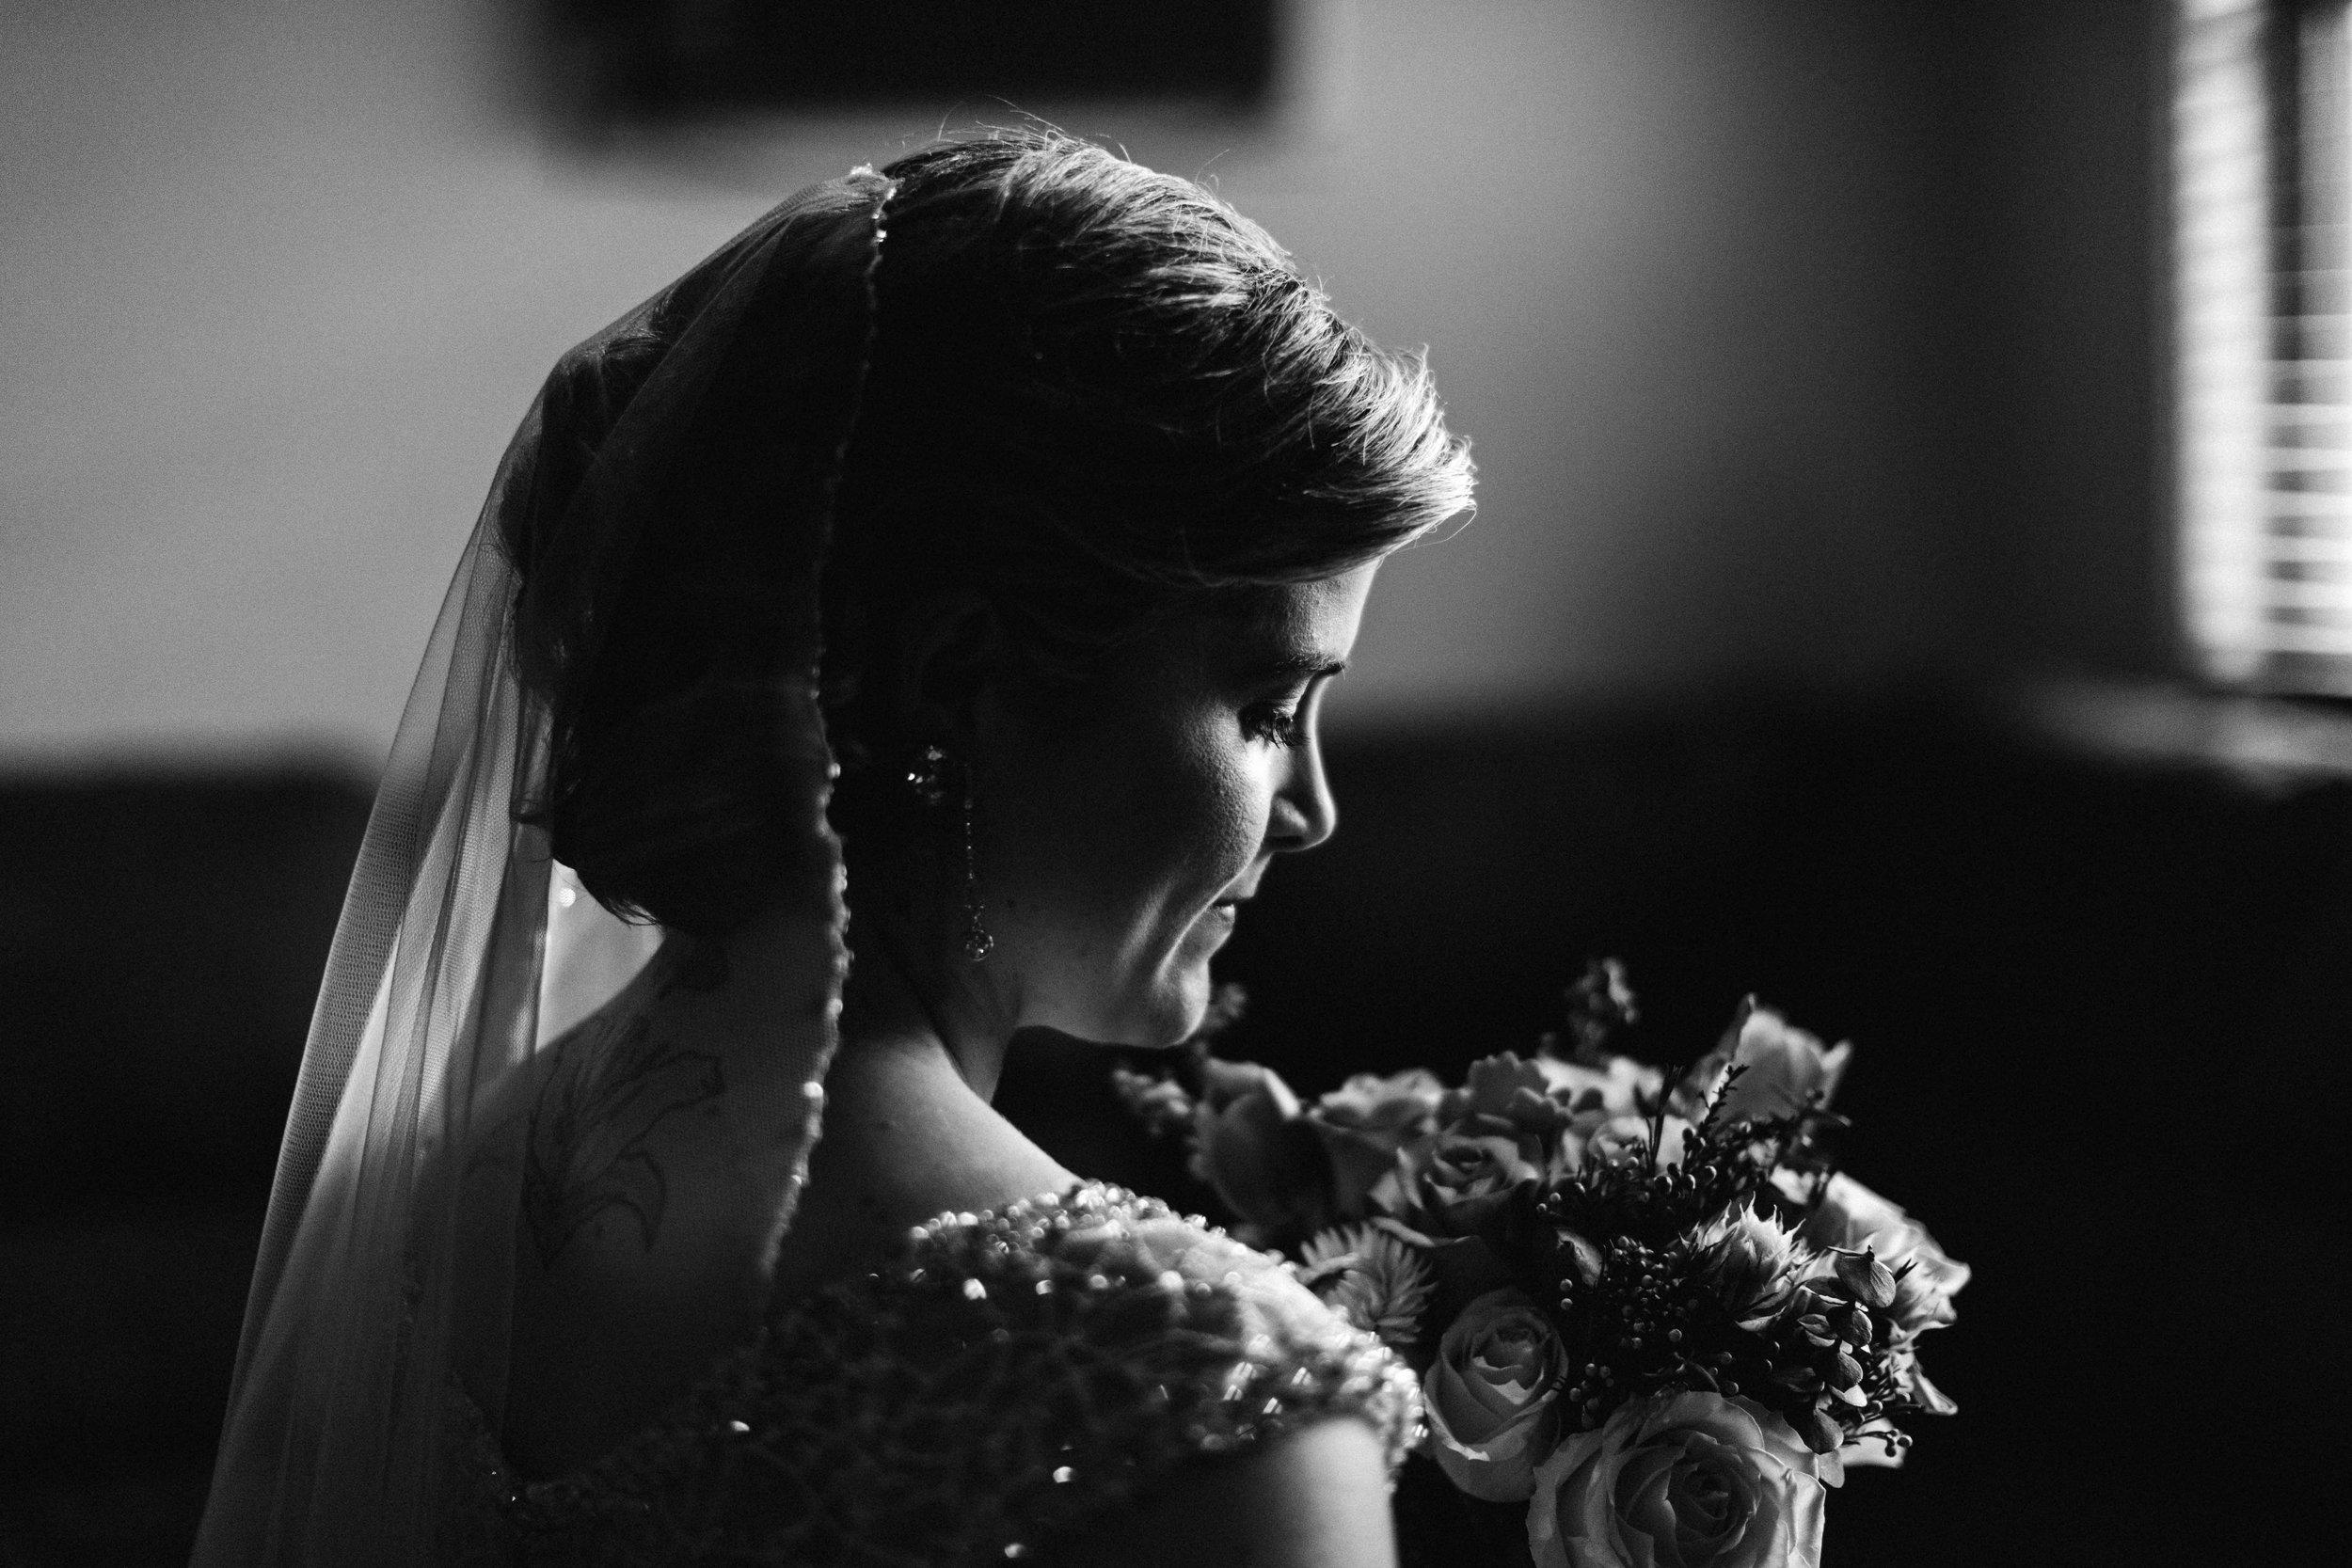 appin-house-wedding-macarthur-www.emilyobrienphotography.net-38.jpg